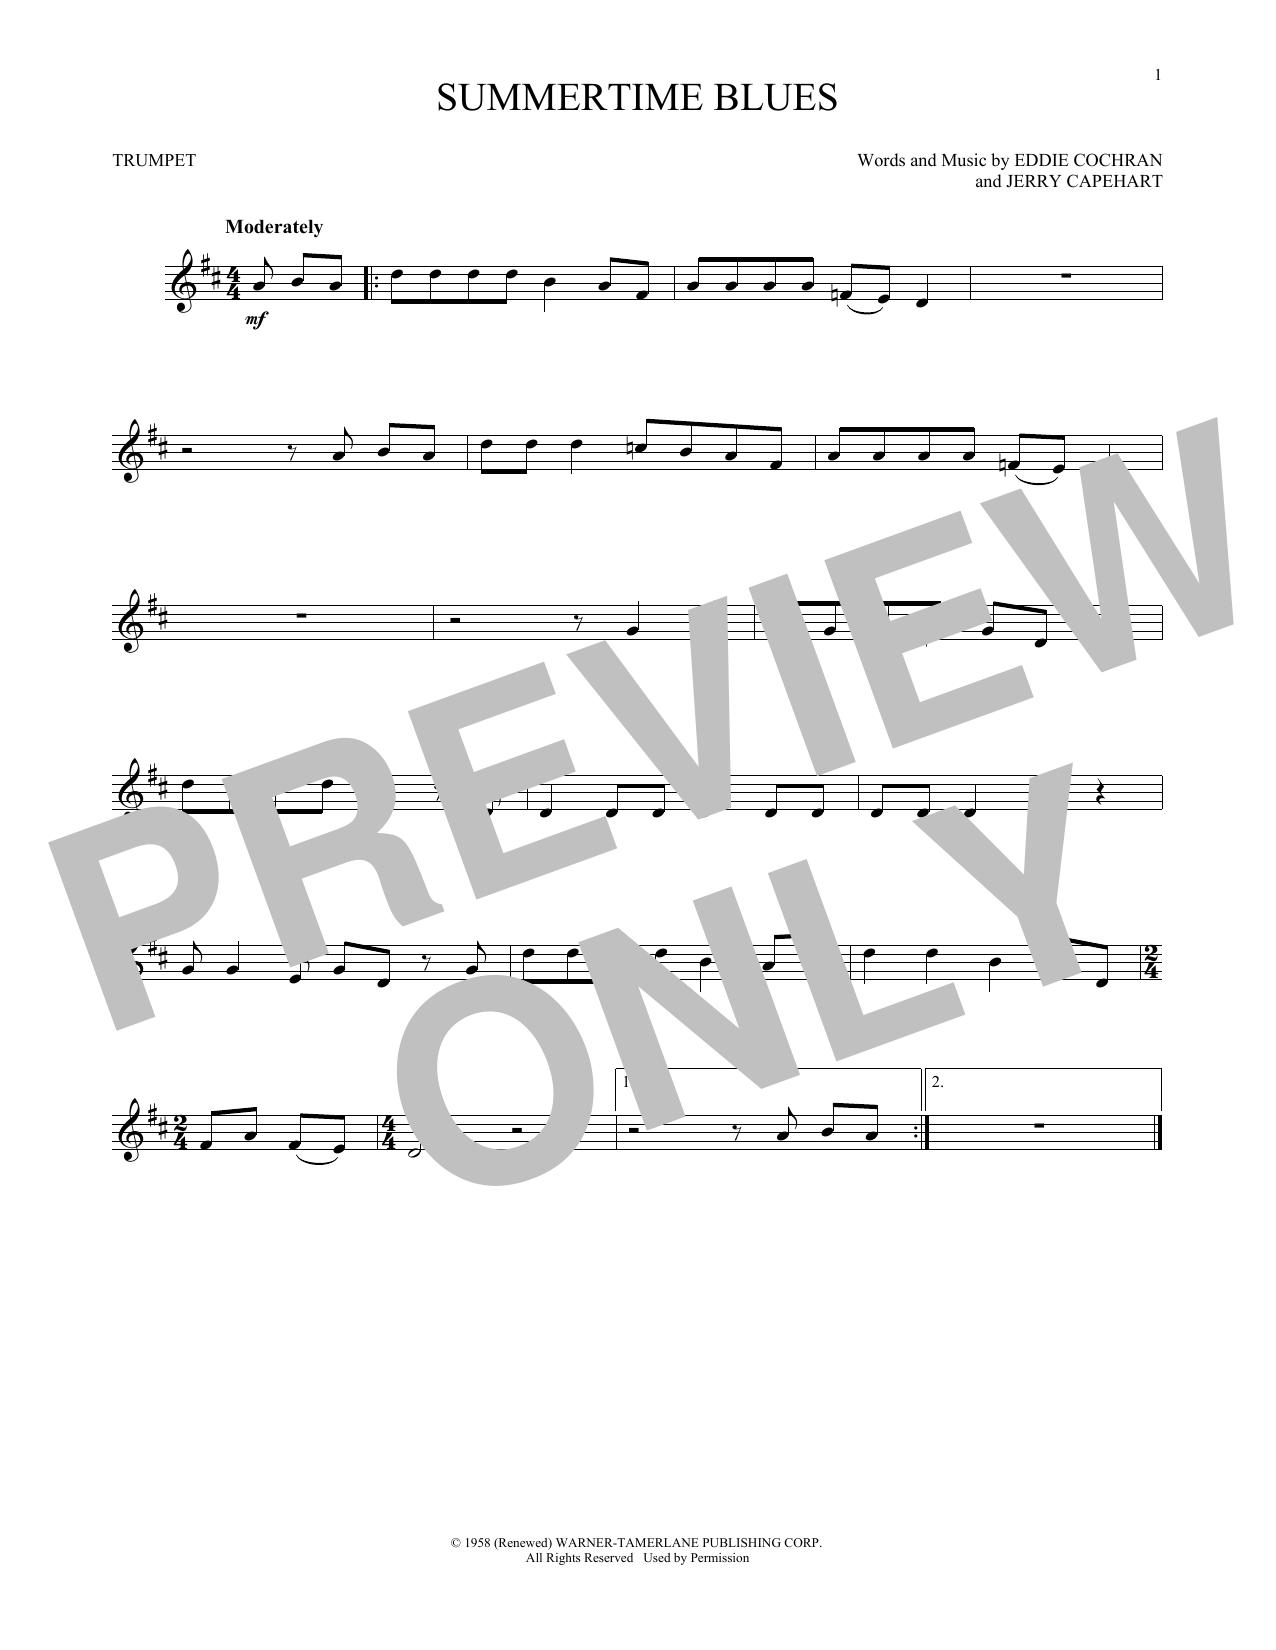 Summertime Blues (Trumpet Solo)